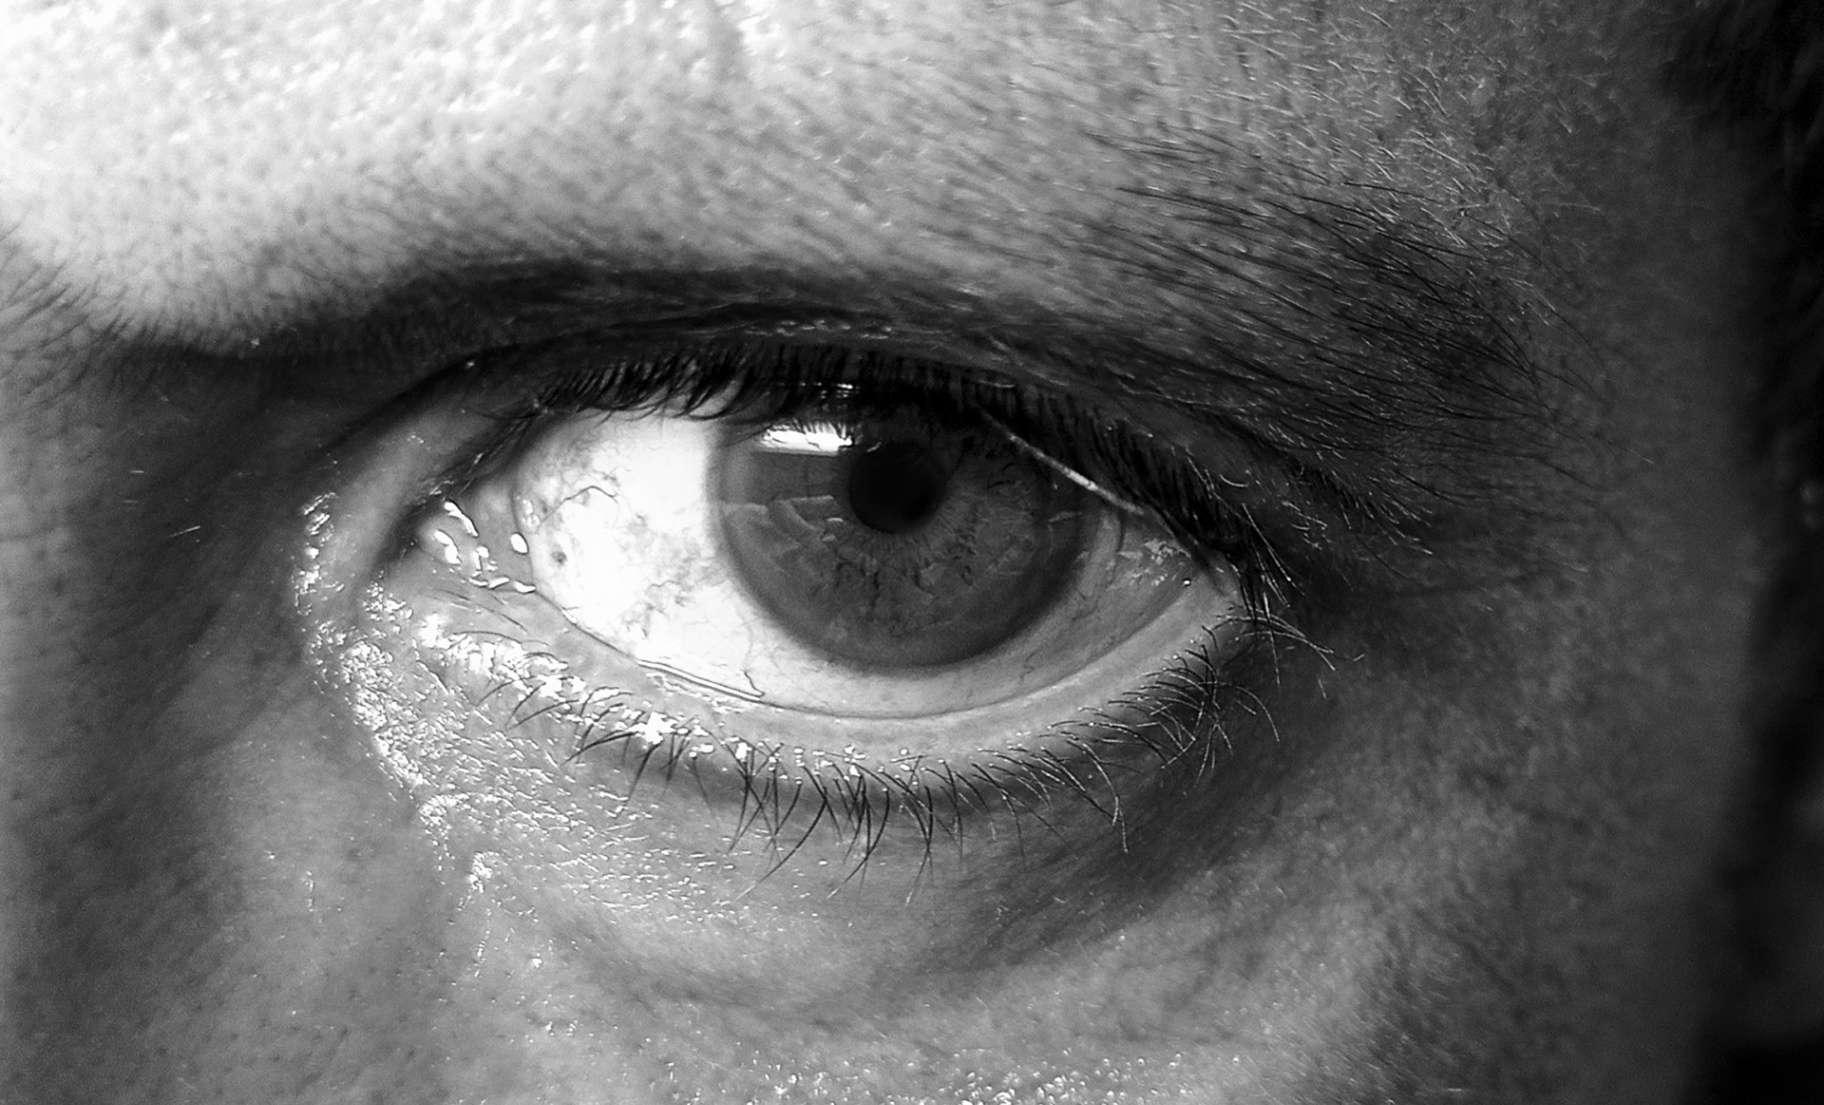 Obra: Self portrait of my eye